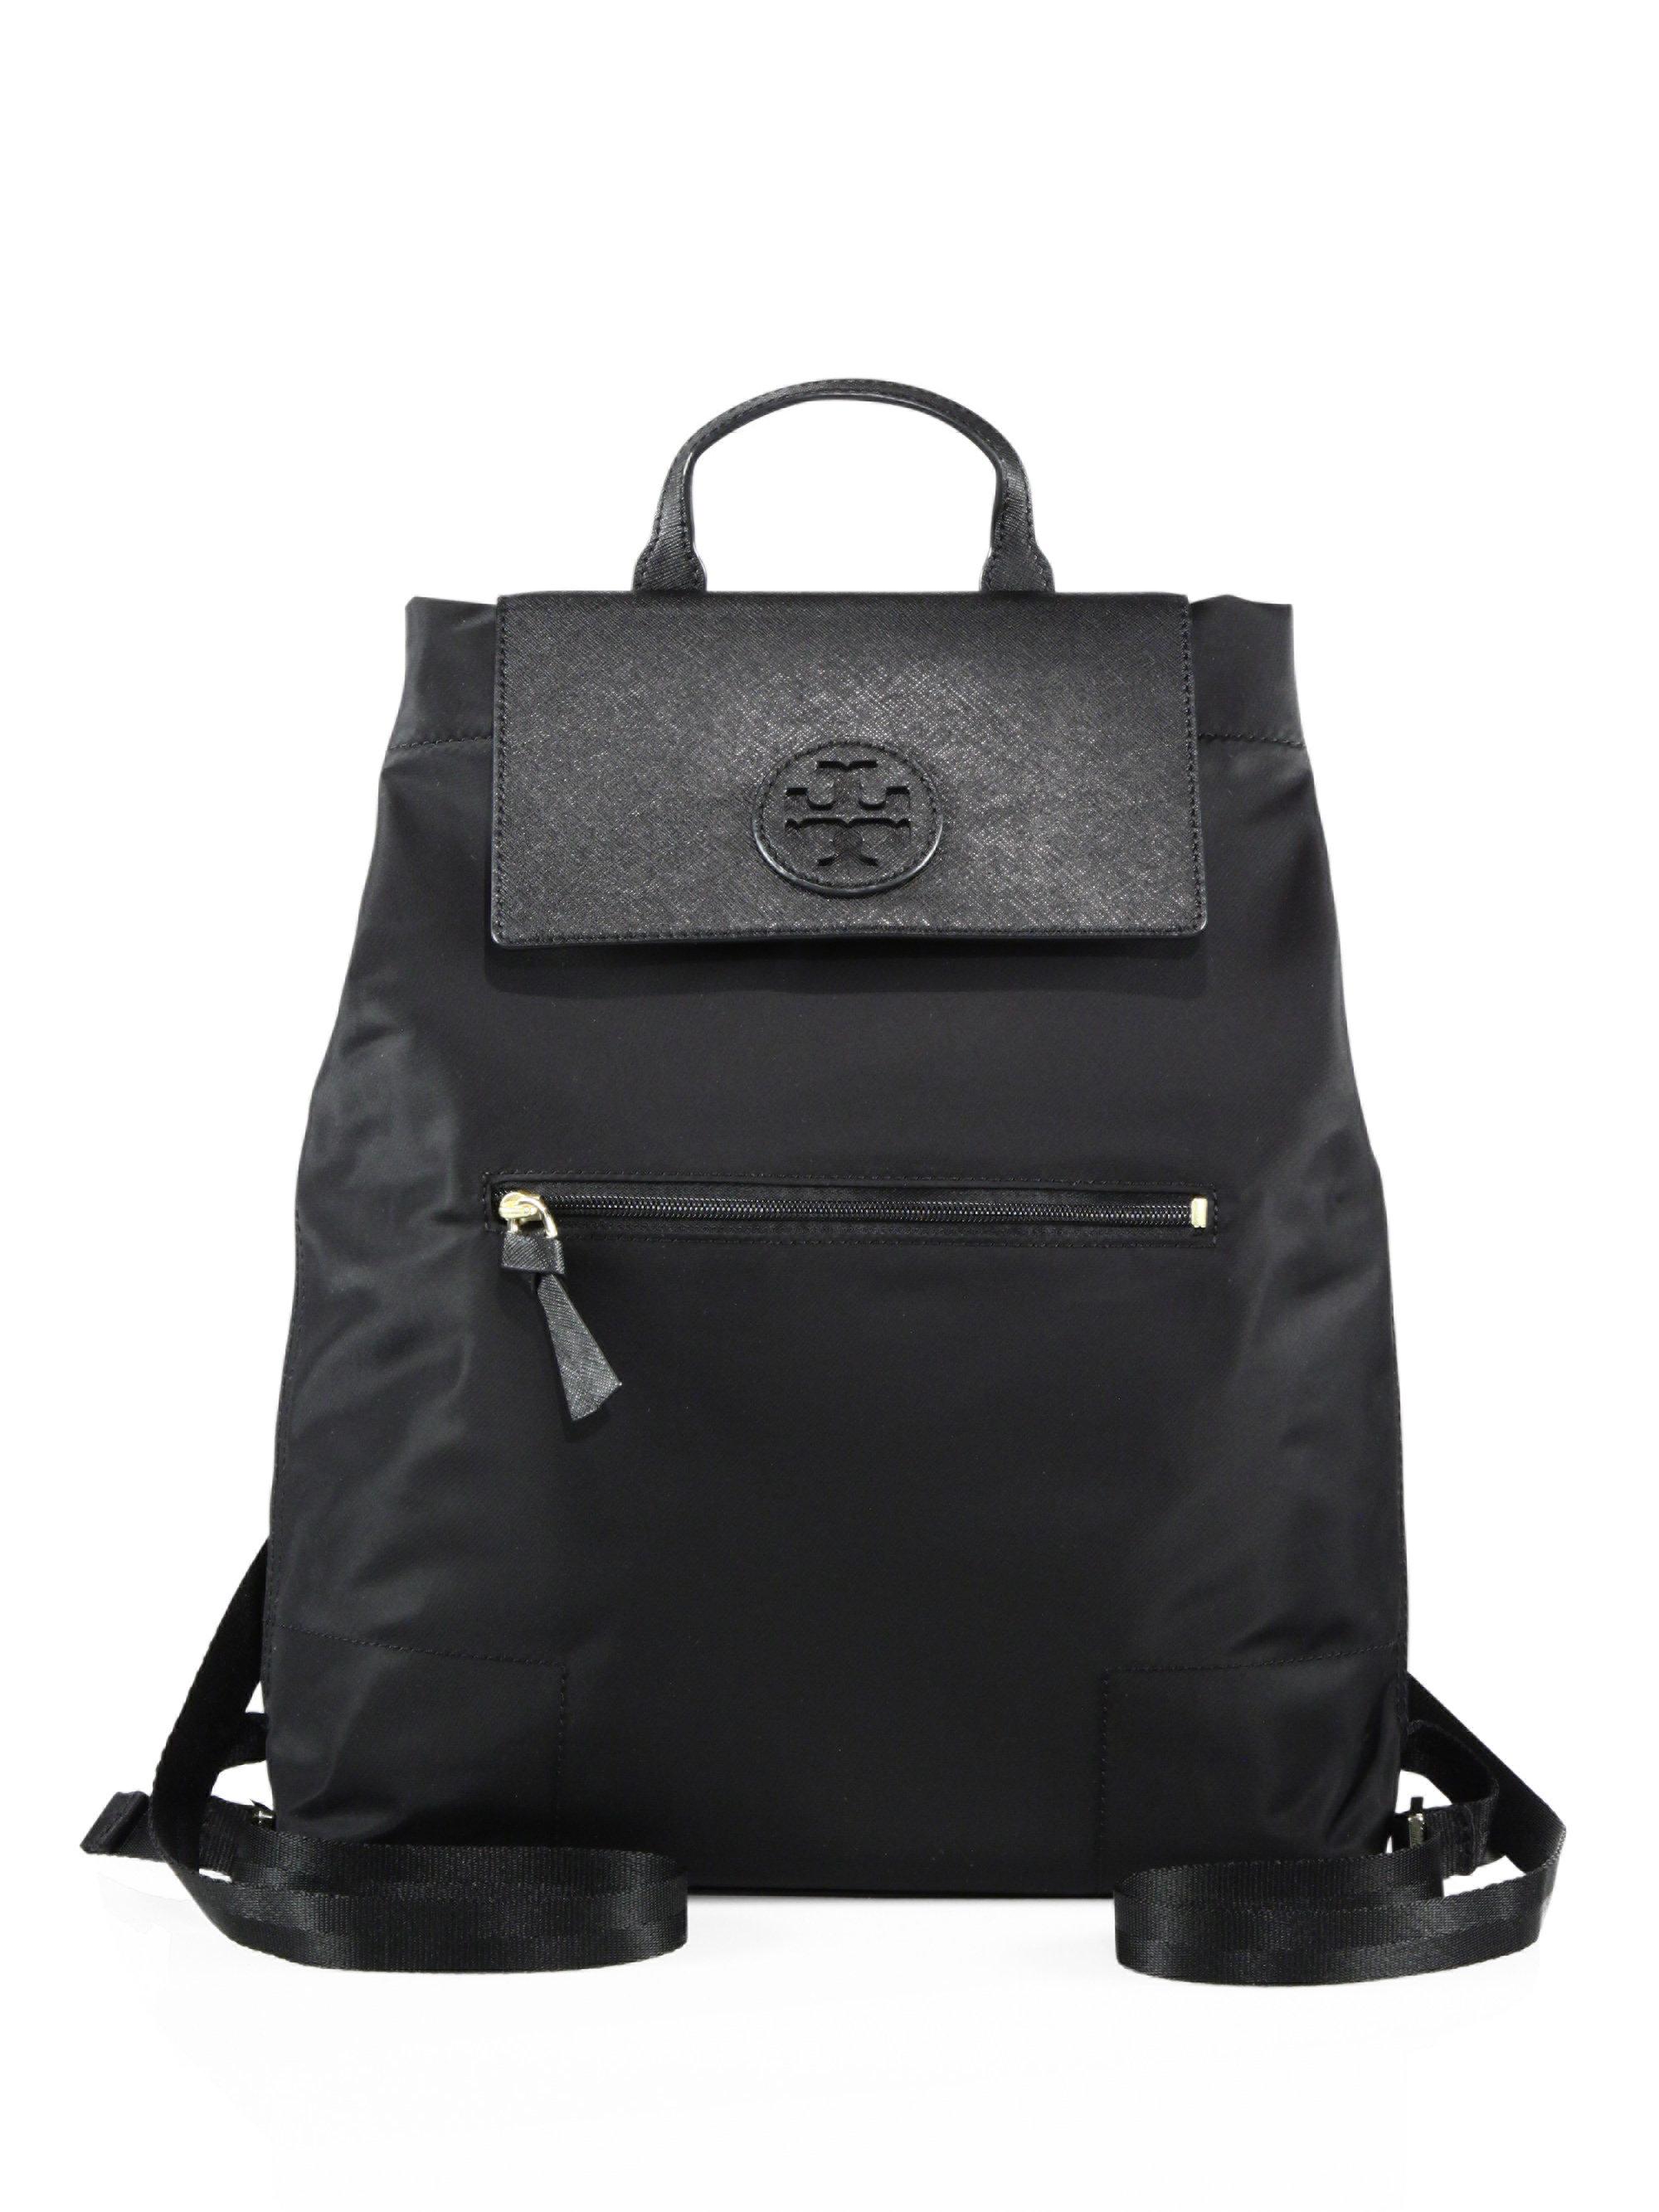 Lyst Tory Burch Ella Nylon Backpack In Black